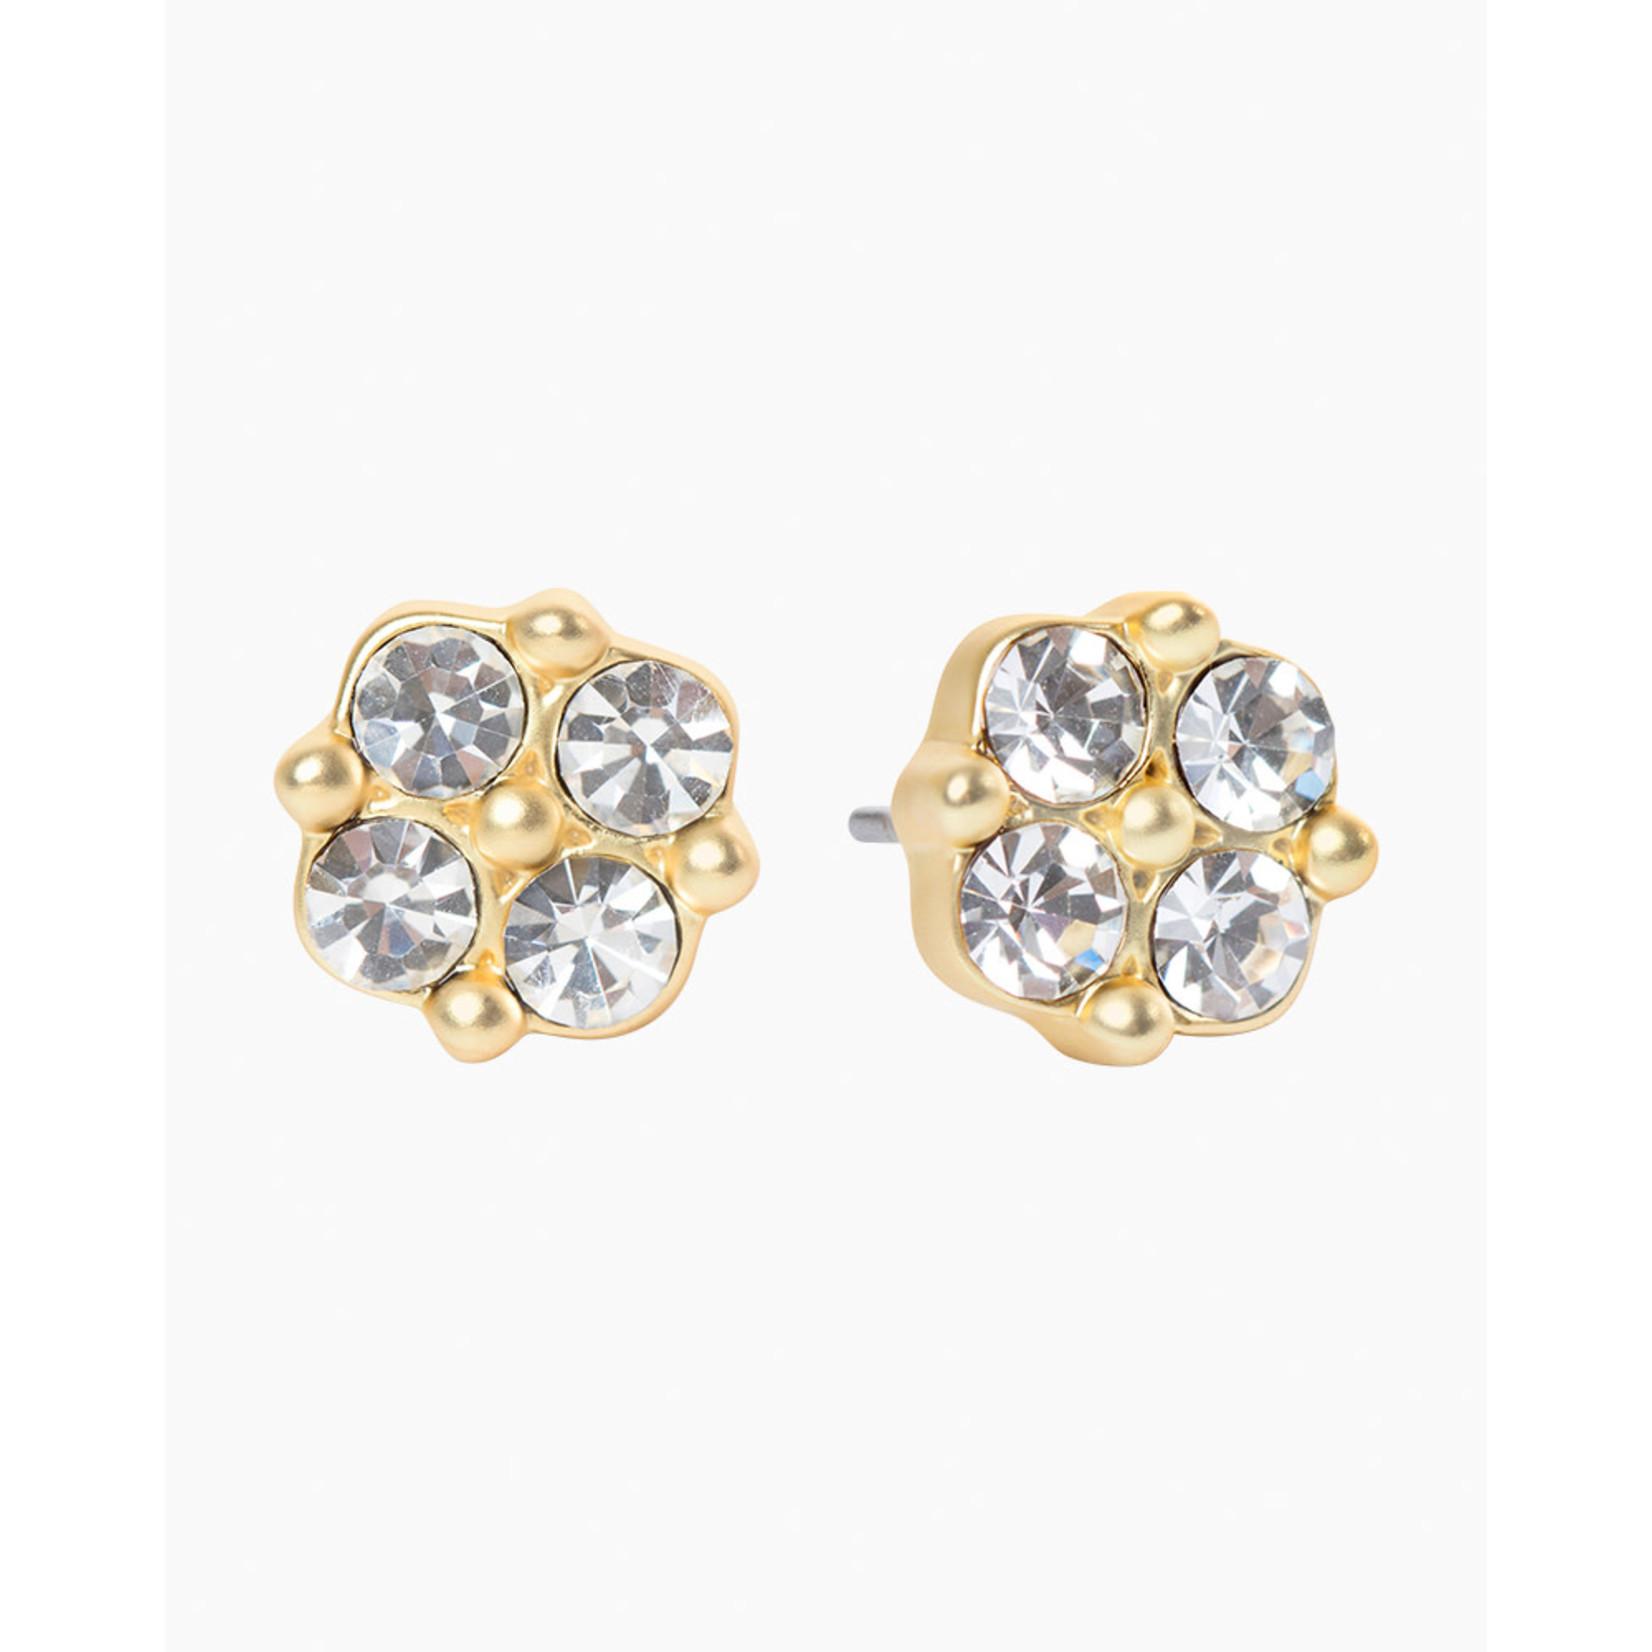 Spartina Sea La Vie Stud Earrings- Blessed/Crystal Clover